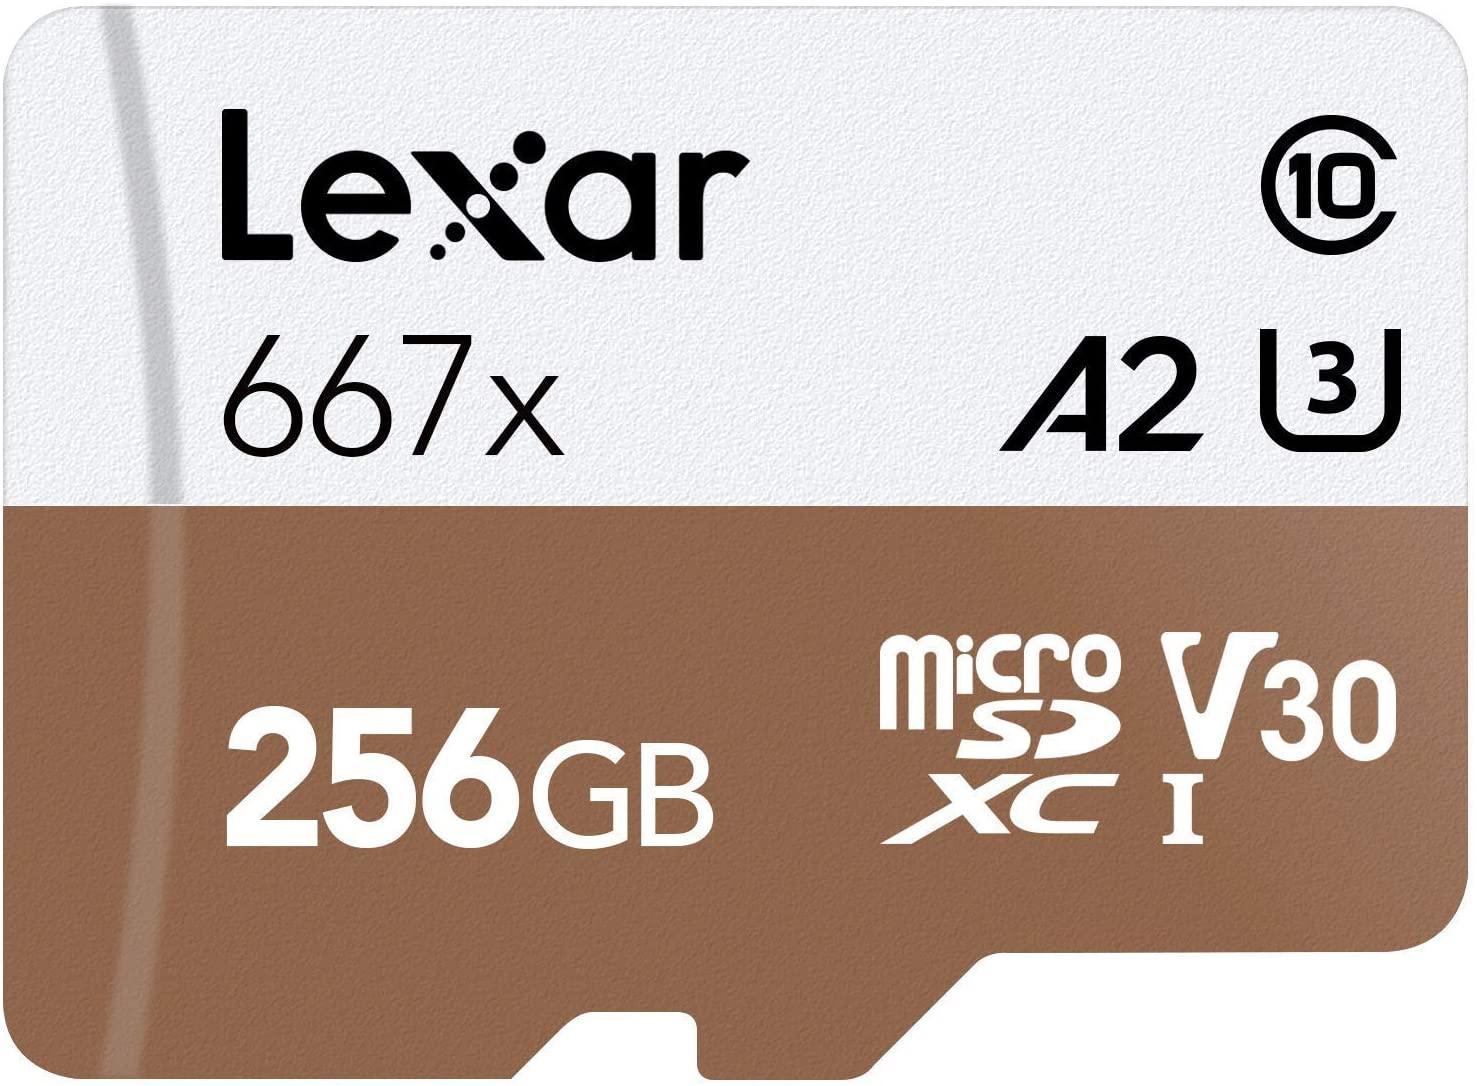 Amazon: Lexar Professional 256GB Micro SD A2 V30 UHS-I/U3 Card  - Prime Members $33.99